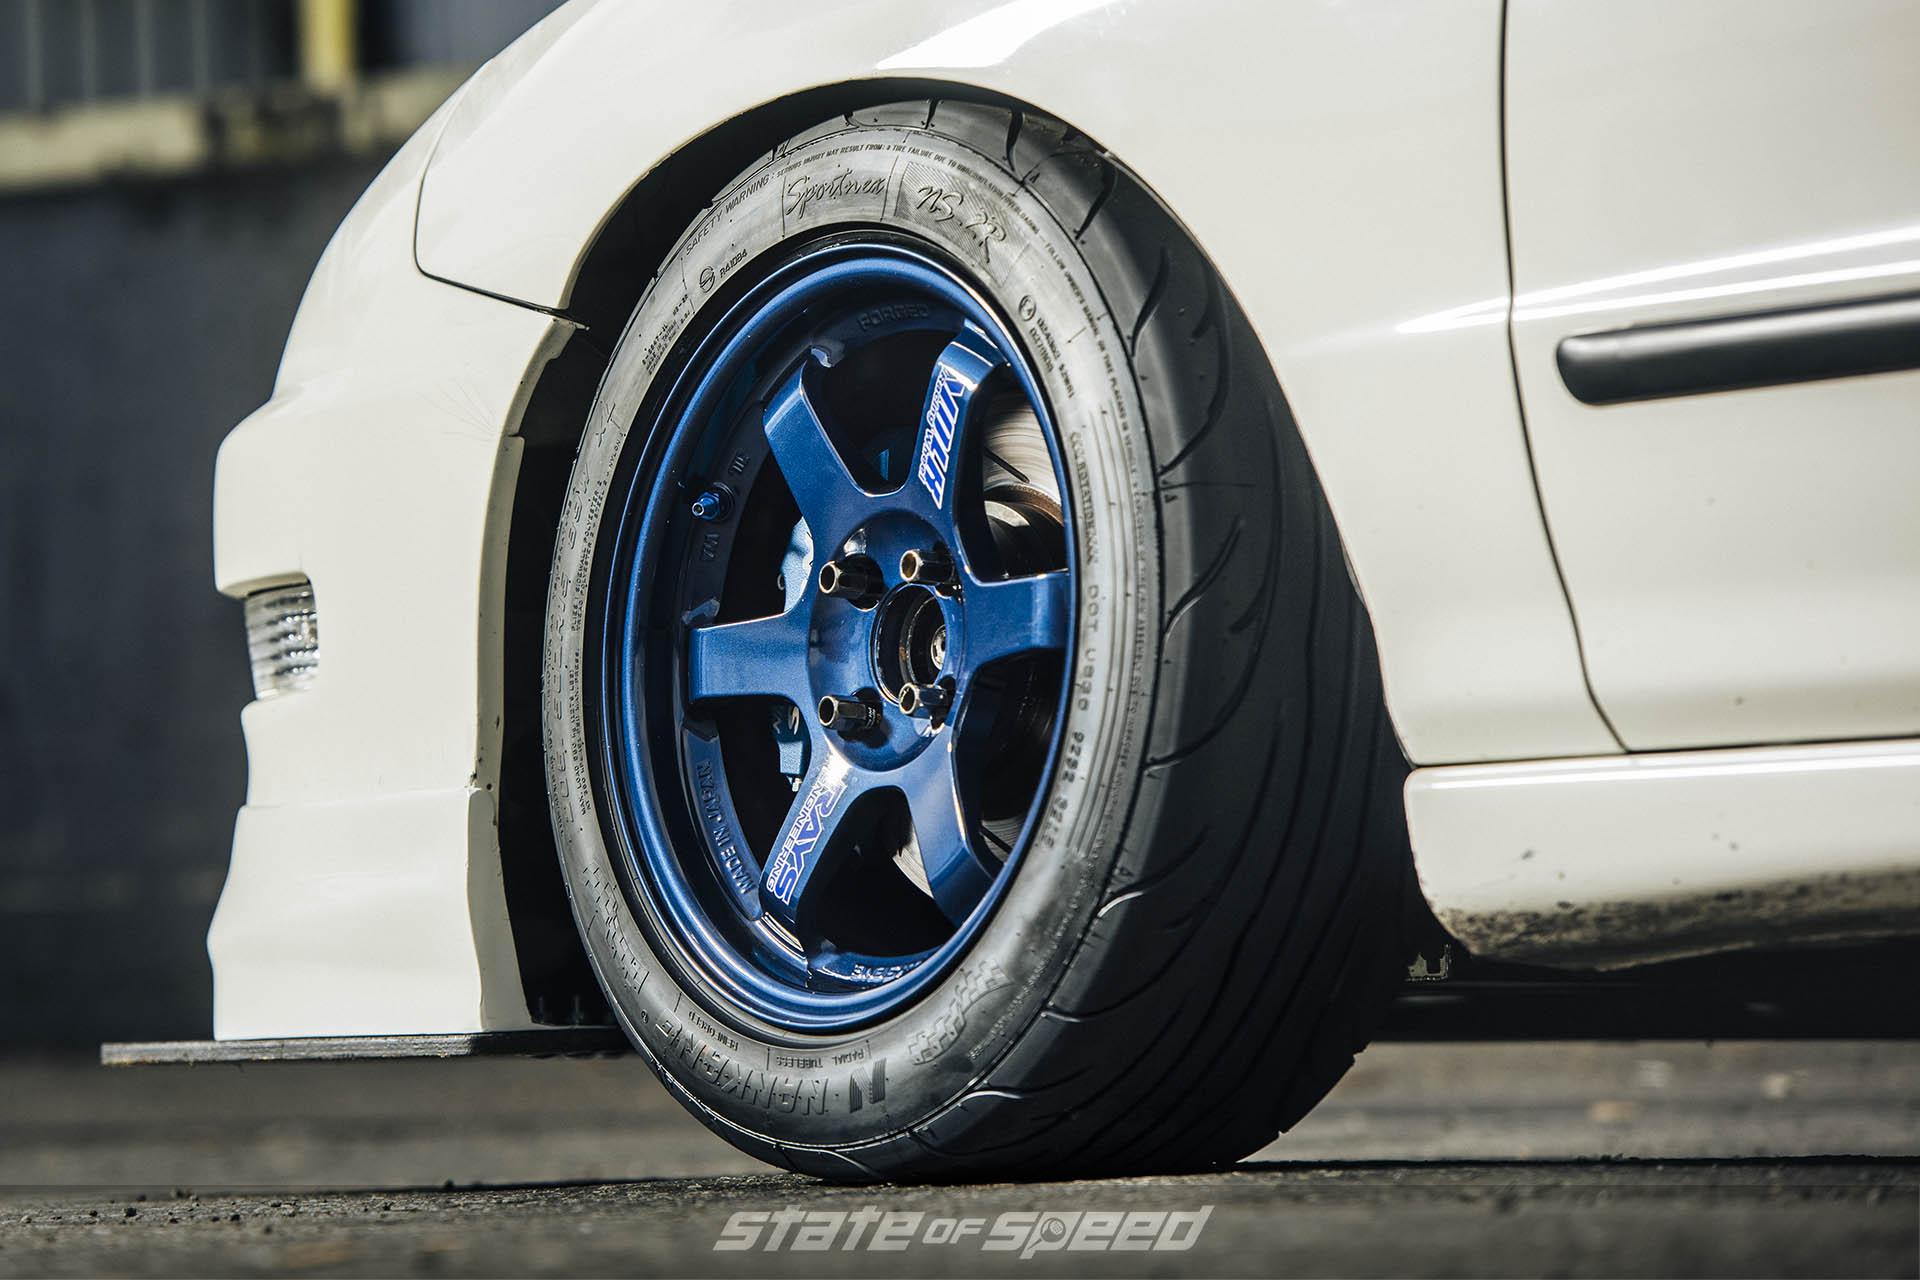 Integra with Volk TE37 Forged wheels and Nankang NS2R tires